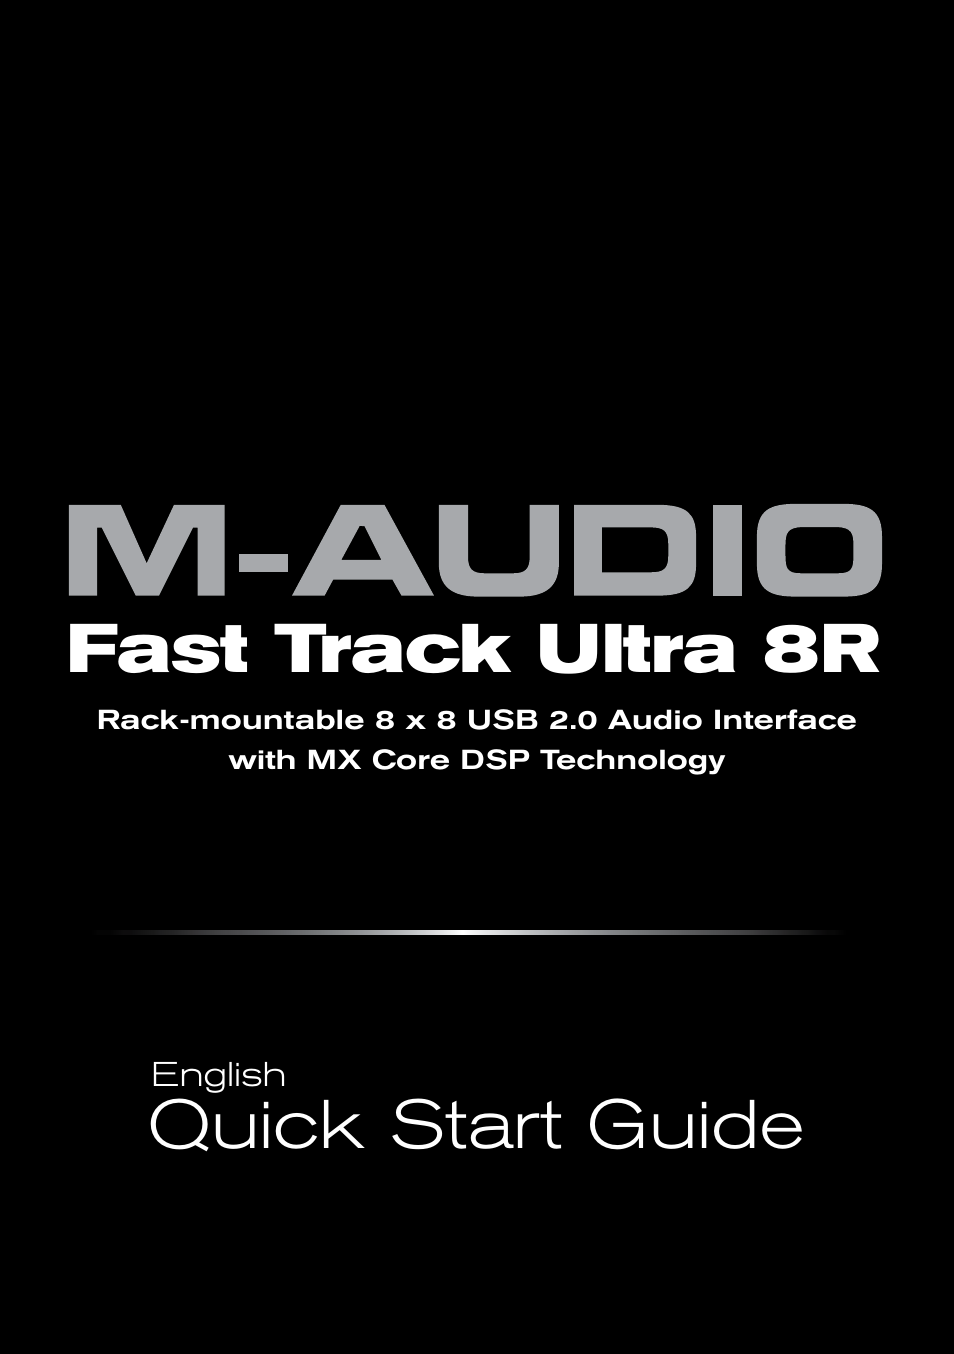 m audio fast track ultra 8r user manual 8 pages. Black Bedroom Furniture Sets. Home Design Ideas